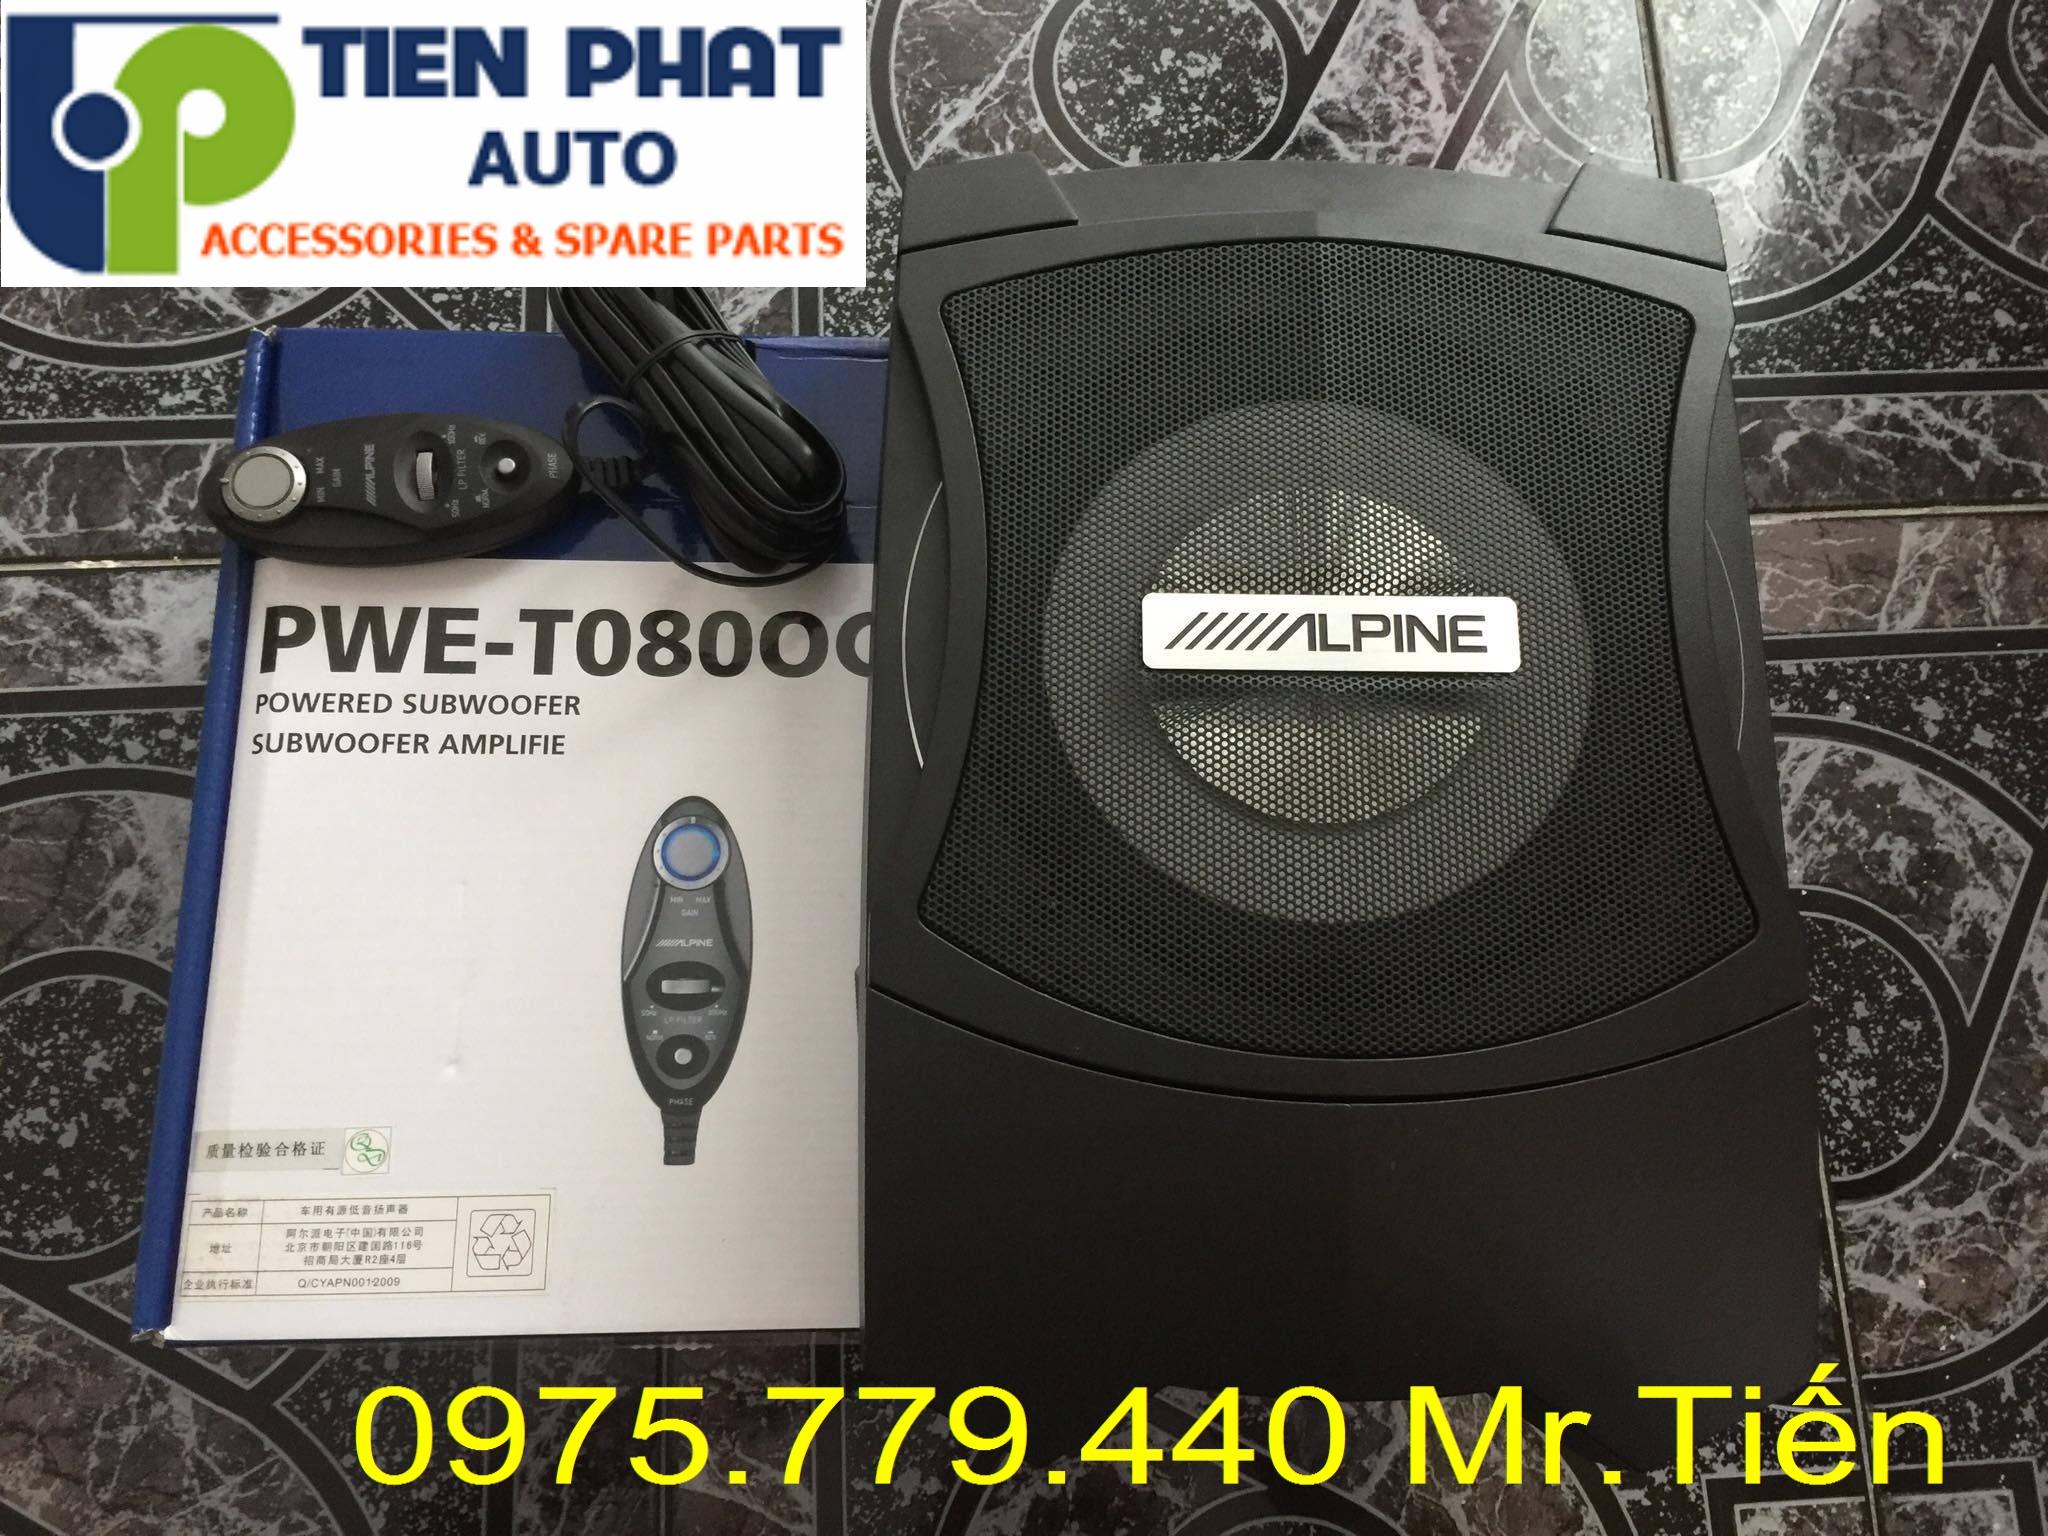 Lắp Loa sub Alpine PWE-T0800C Cho Nissan Sunny Lắp Đặt Tận Nơi